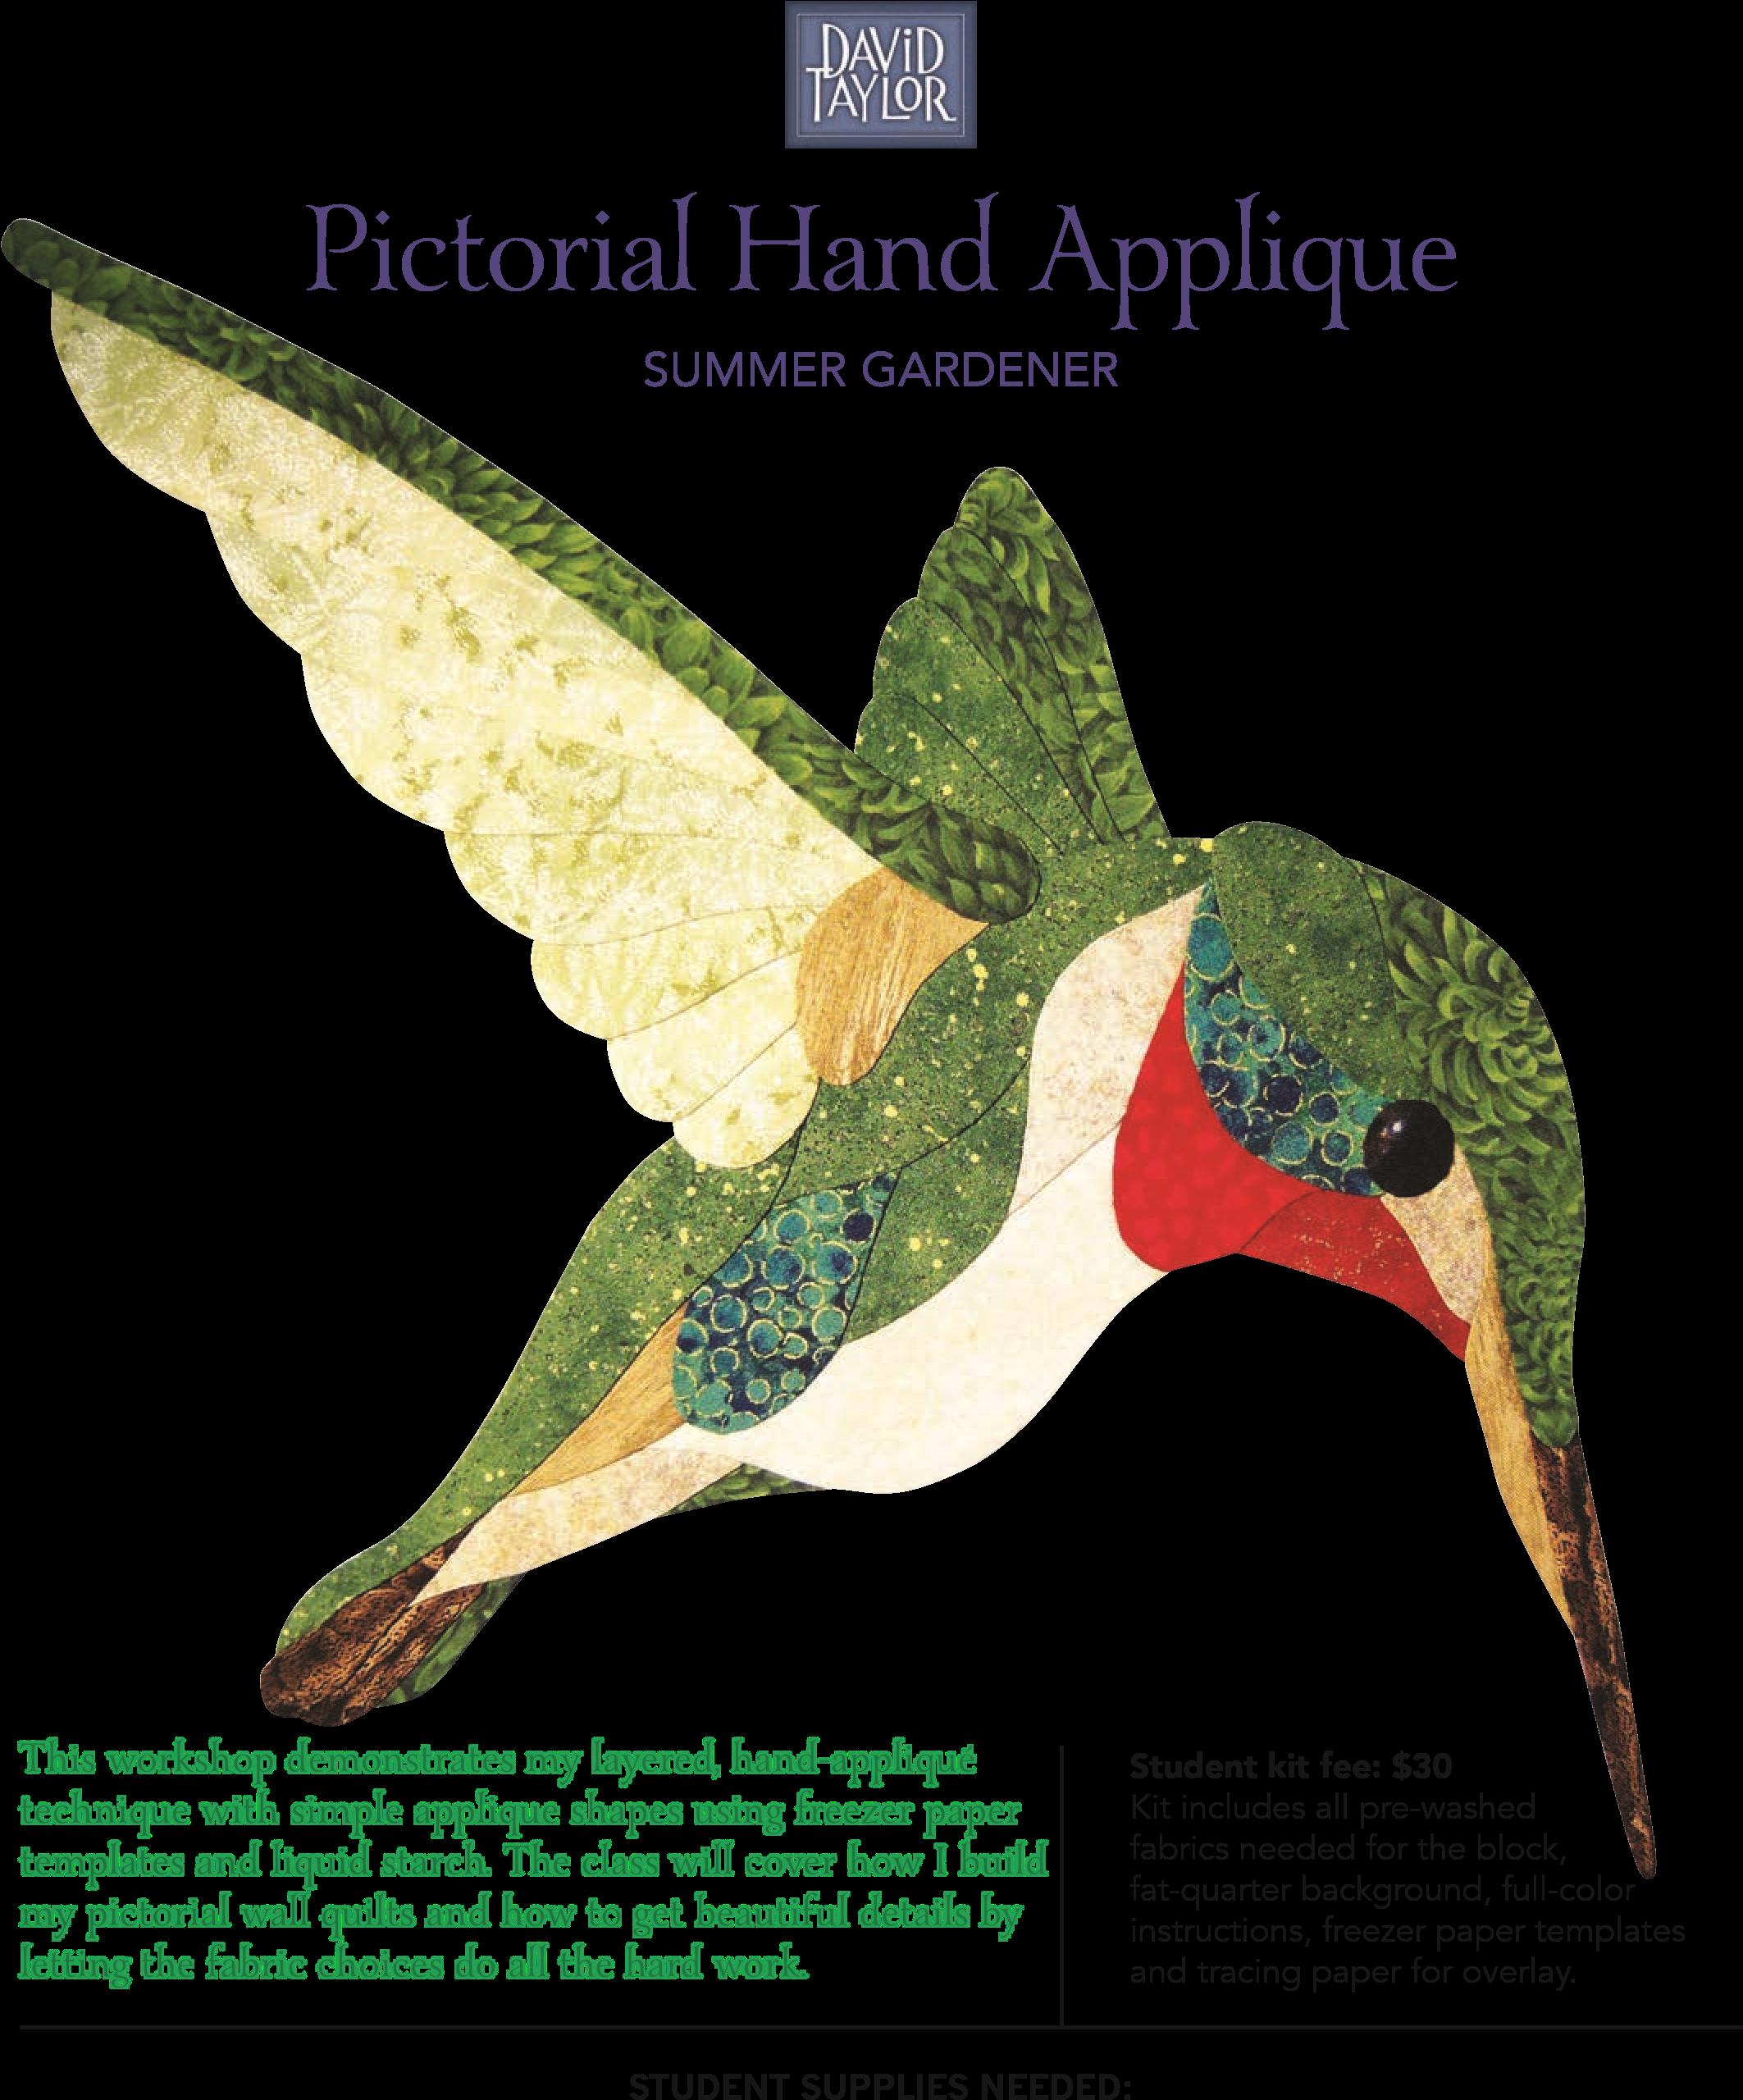 David Taylor Pictorial Hand Applique Summer Gardener